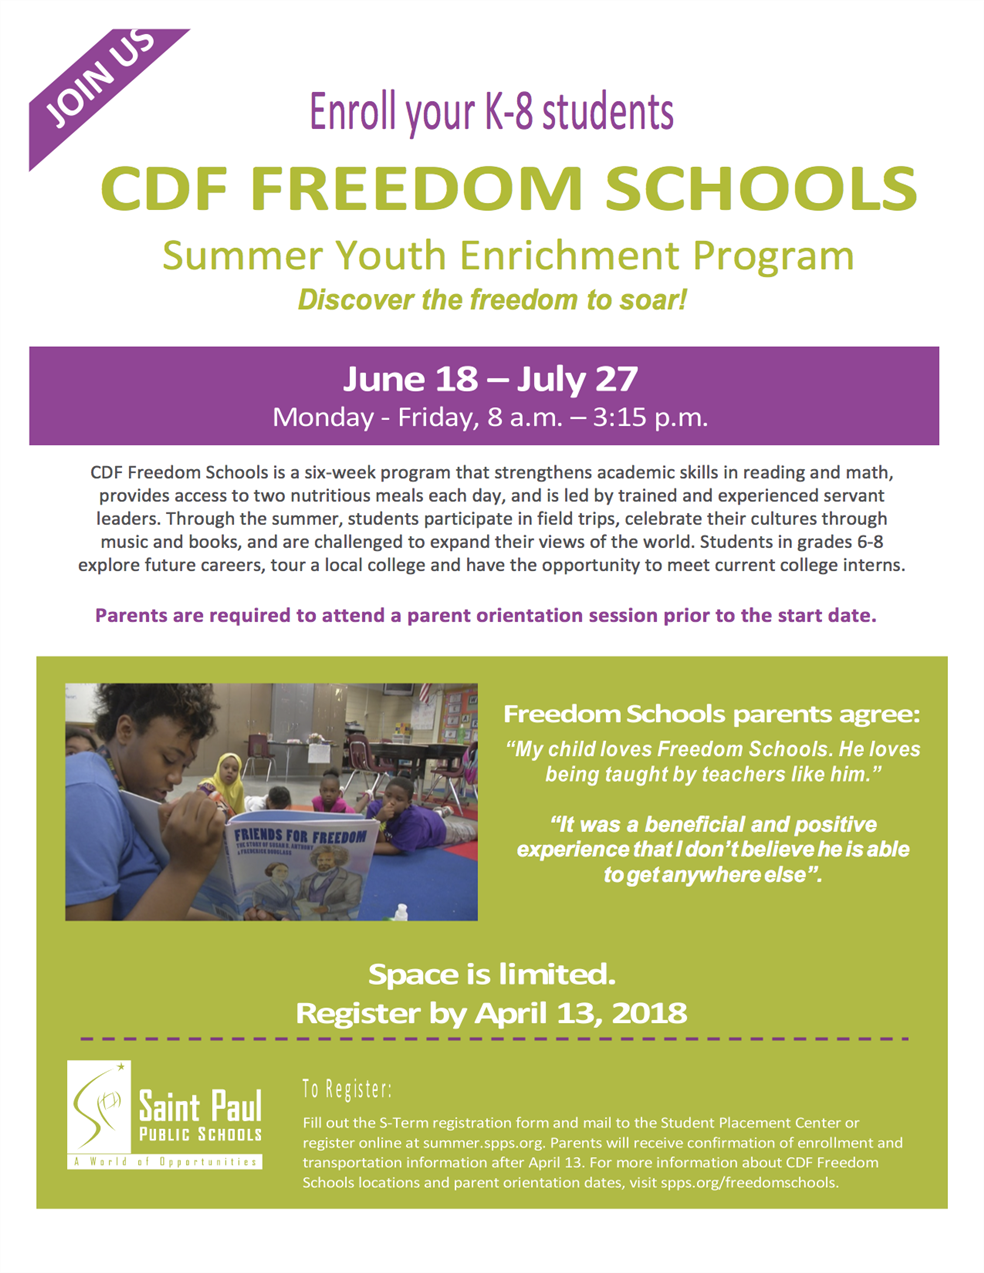 CDF Freedom Schools: A Paradigm Shift. headshot